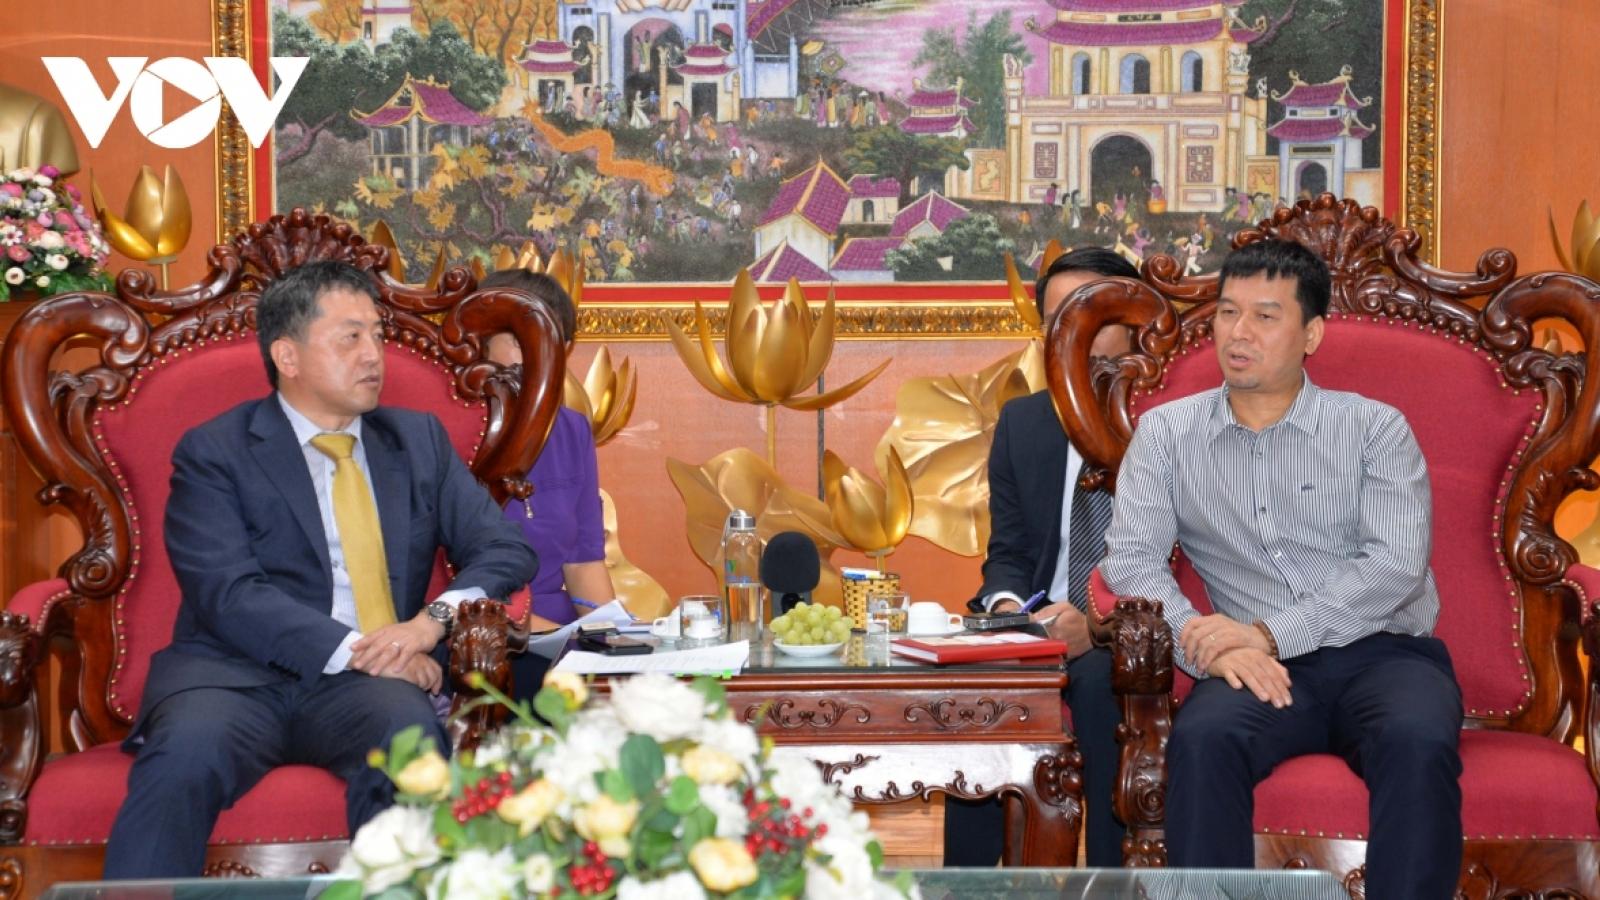 JICA chief representative hails 75-year development path of VOV